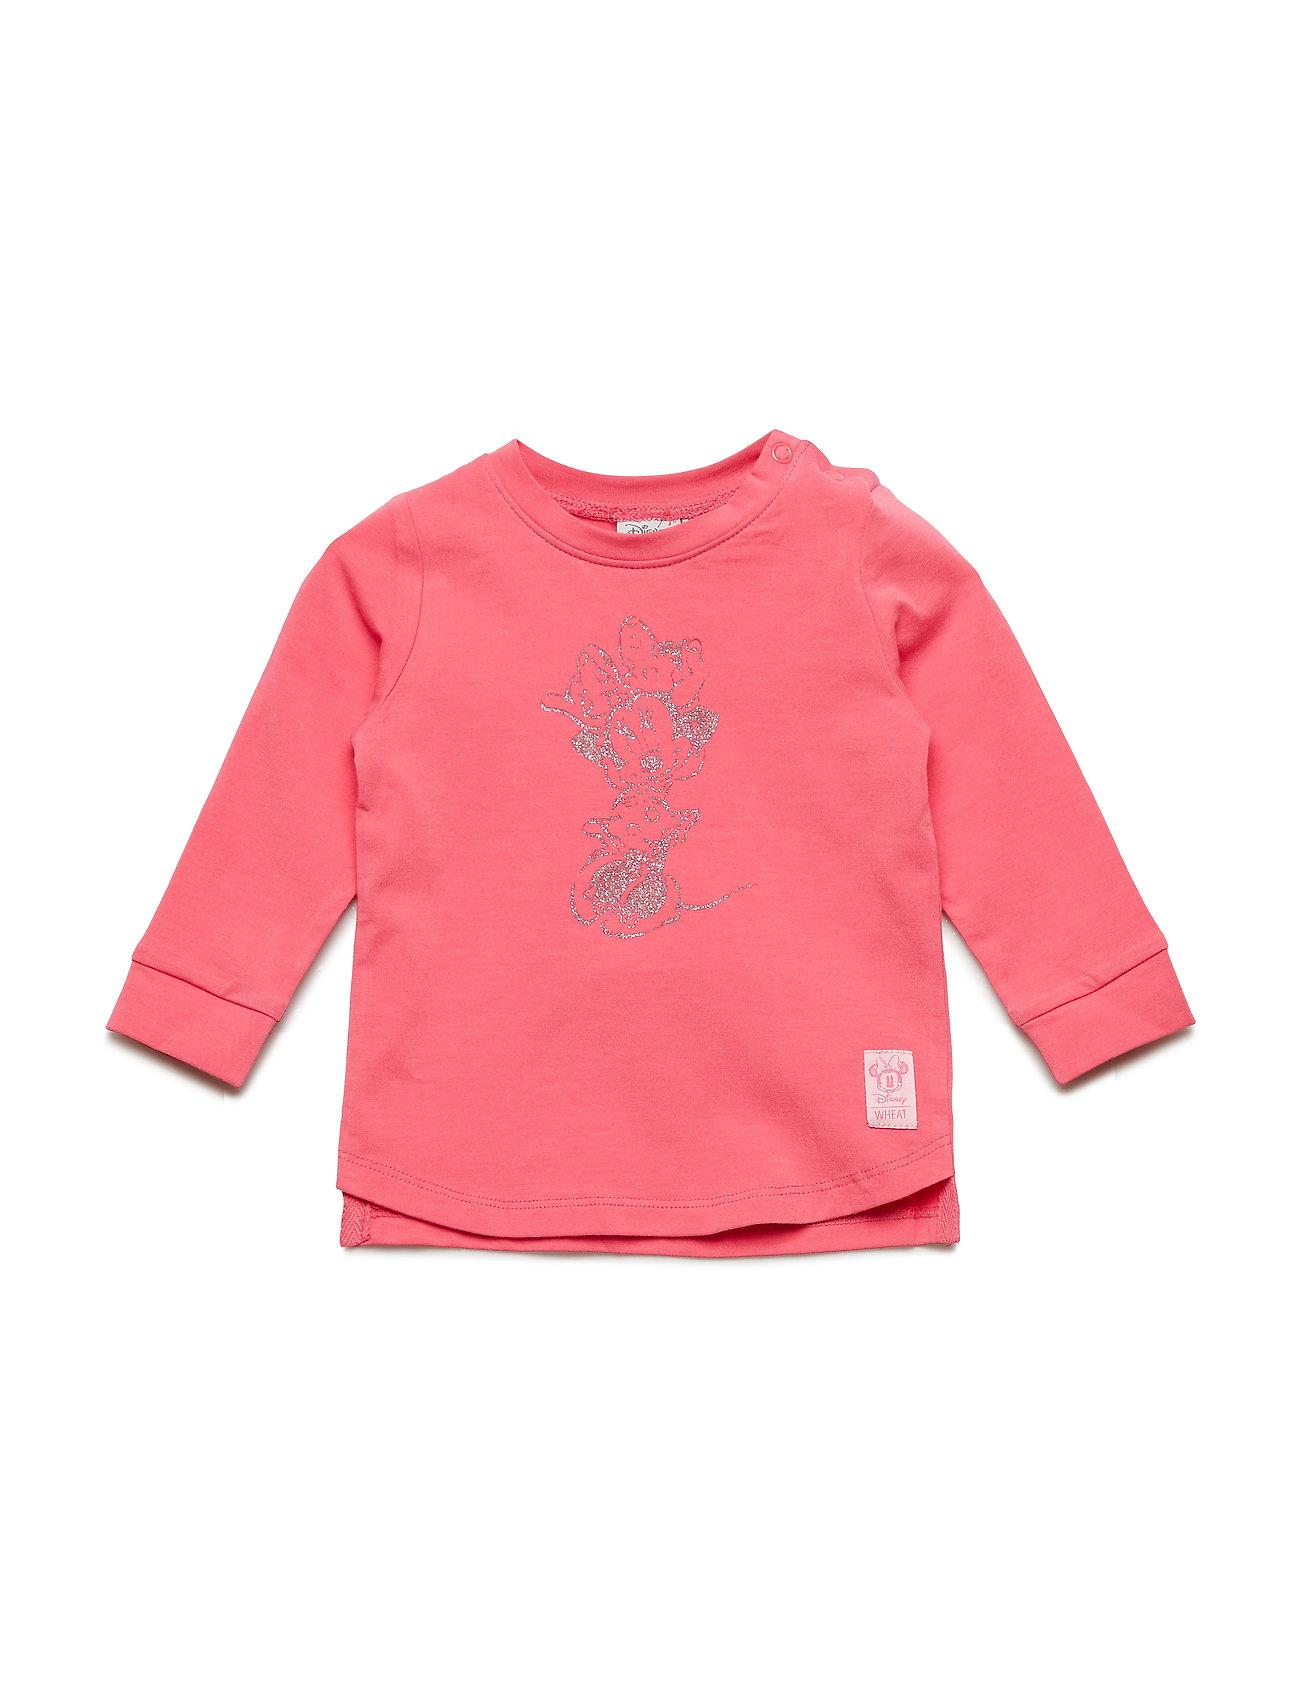 Disney by Wheat T-Shirt Minnie Glitter - CLARET RED